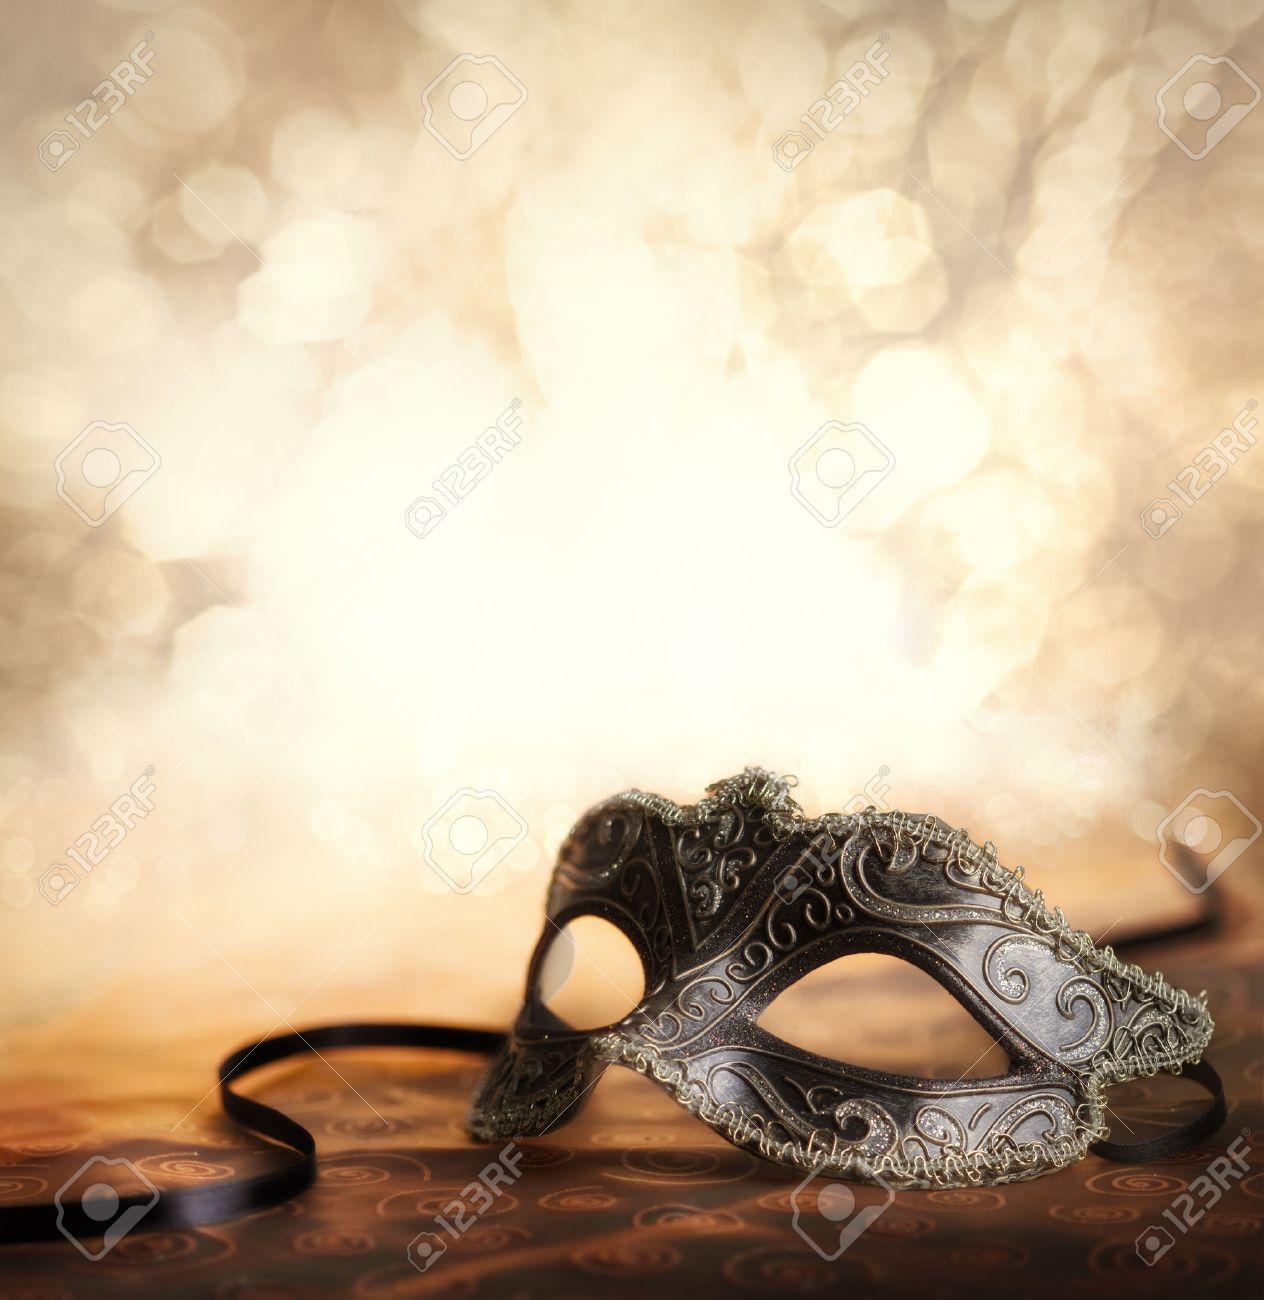 Masquerade Masks Background